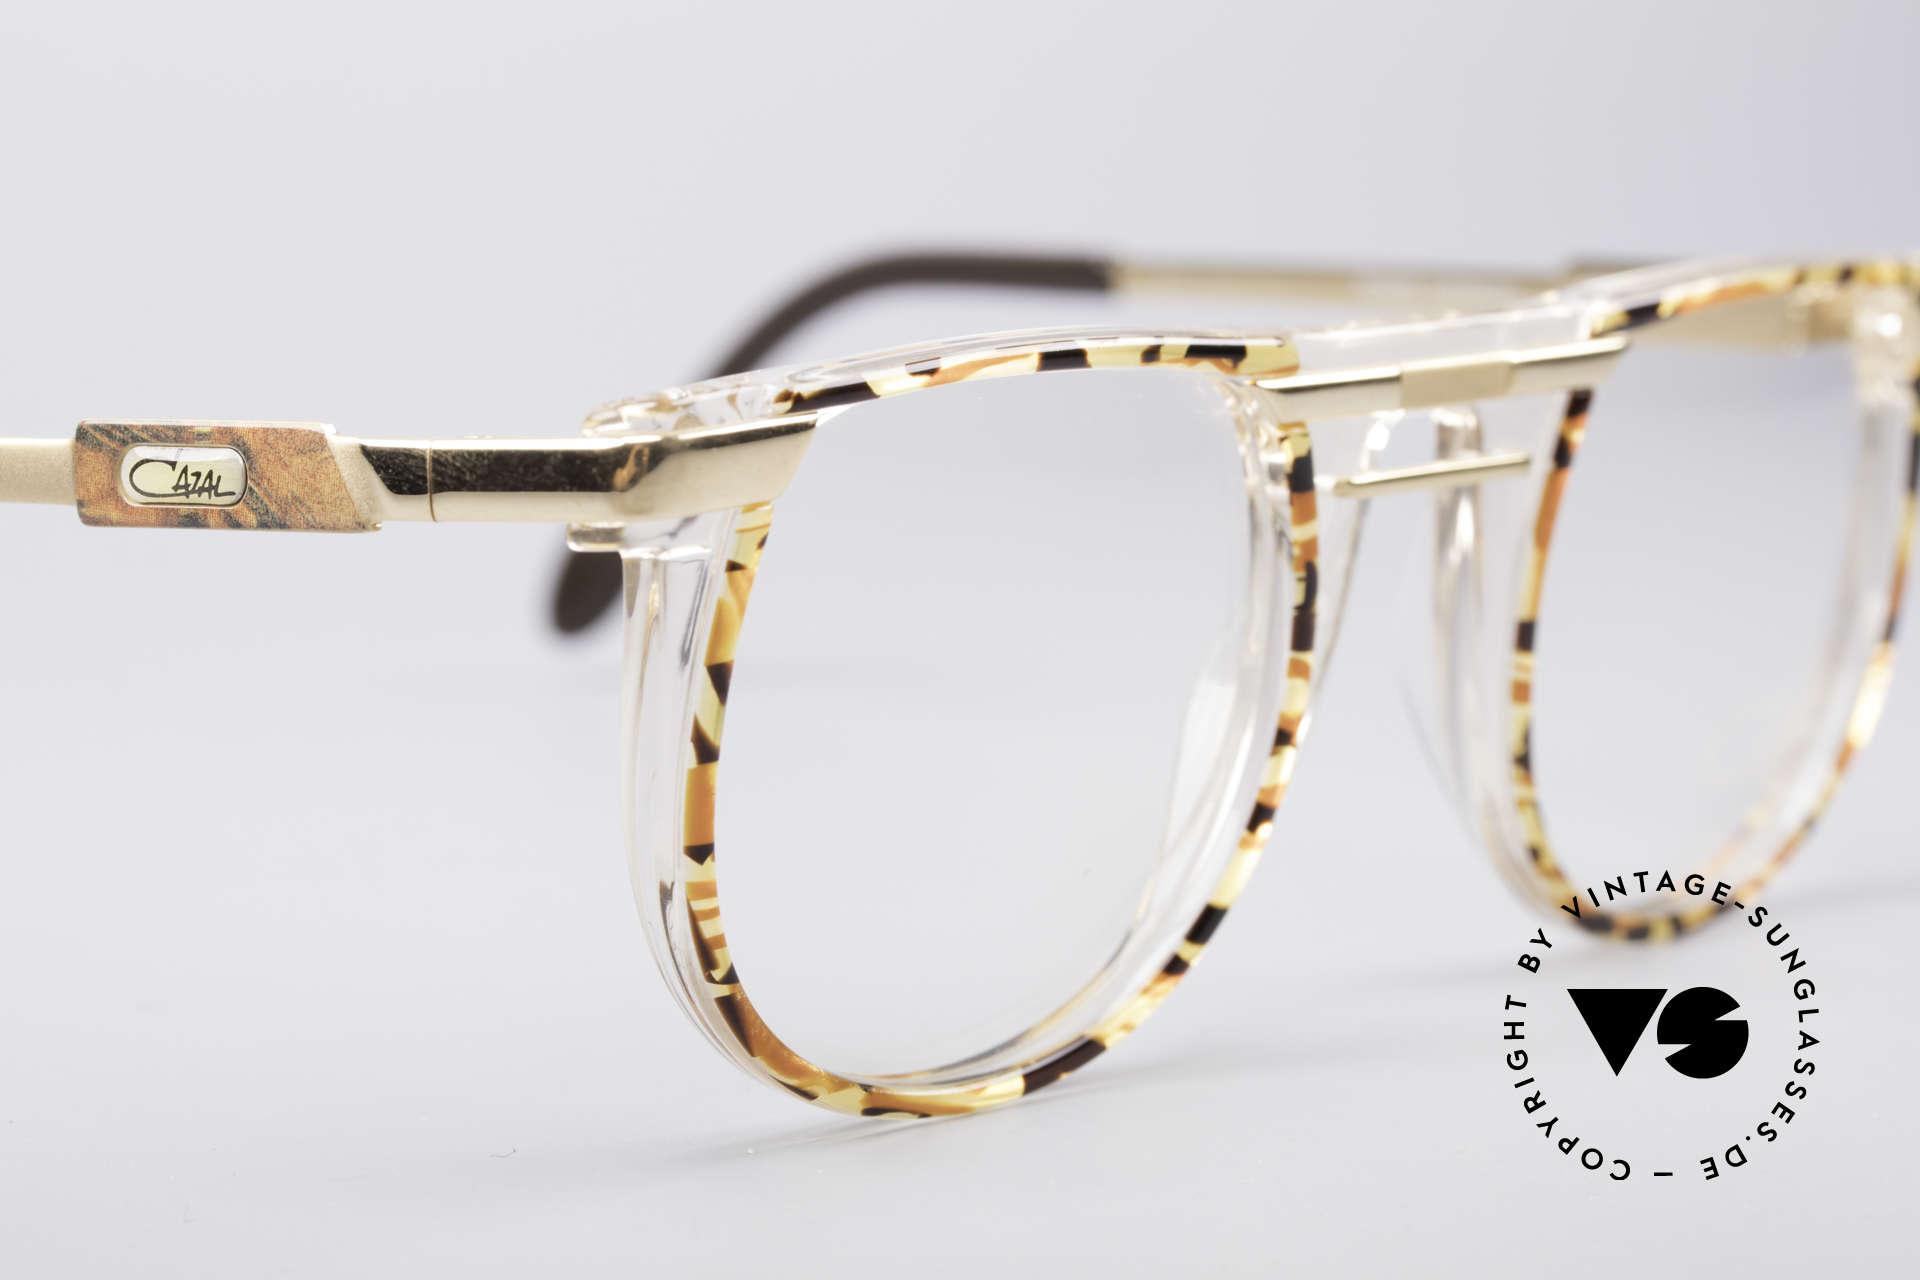 Cazal 647 90's Vintage Designer Specs, unworn, NOS (like all our vintage CAZAL eyewear), Made for Men and Women